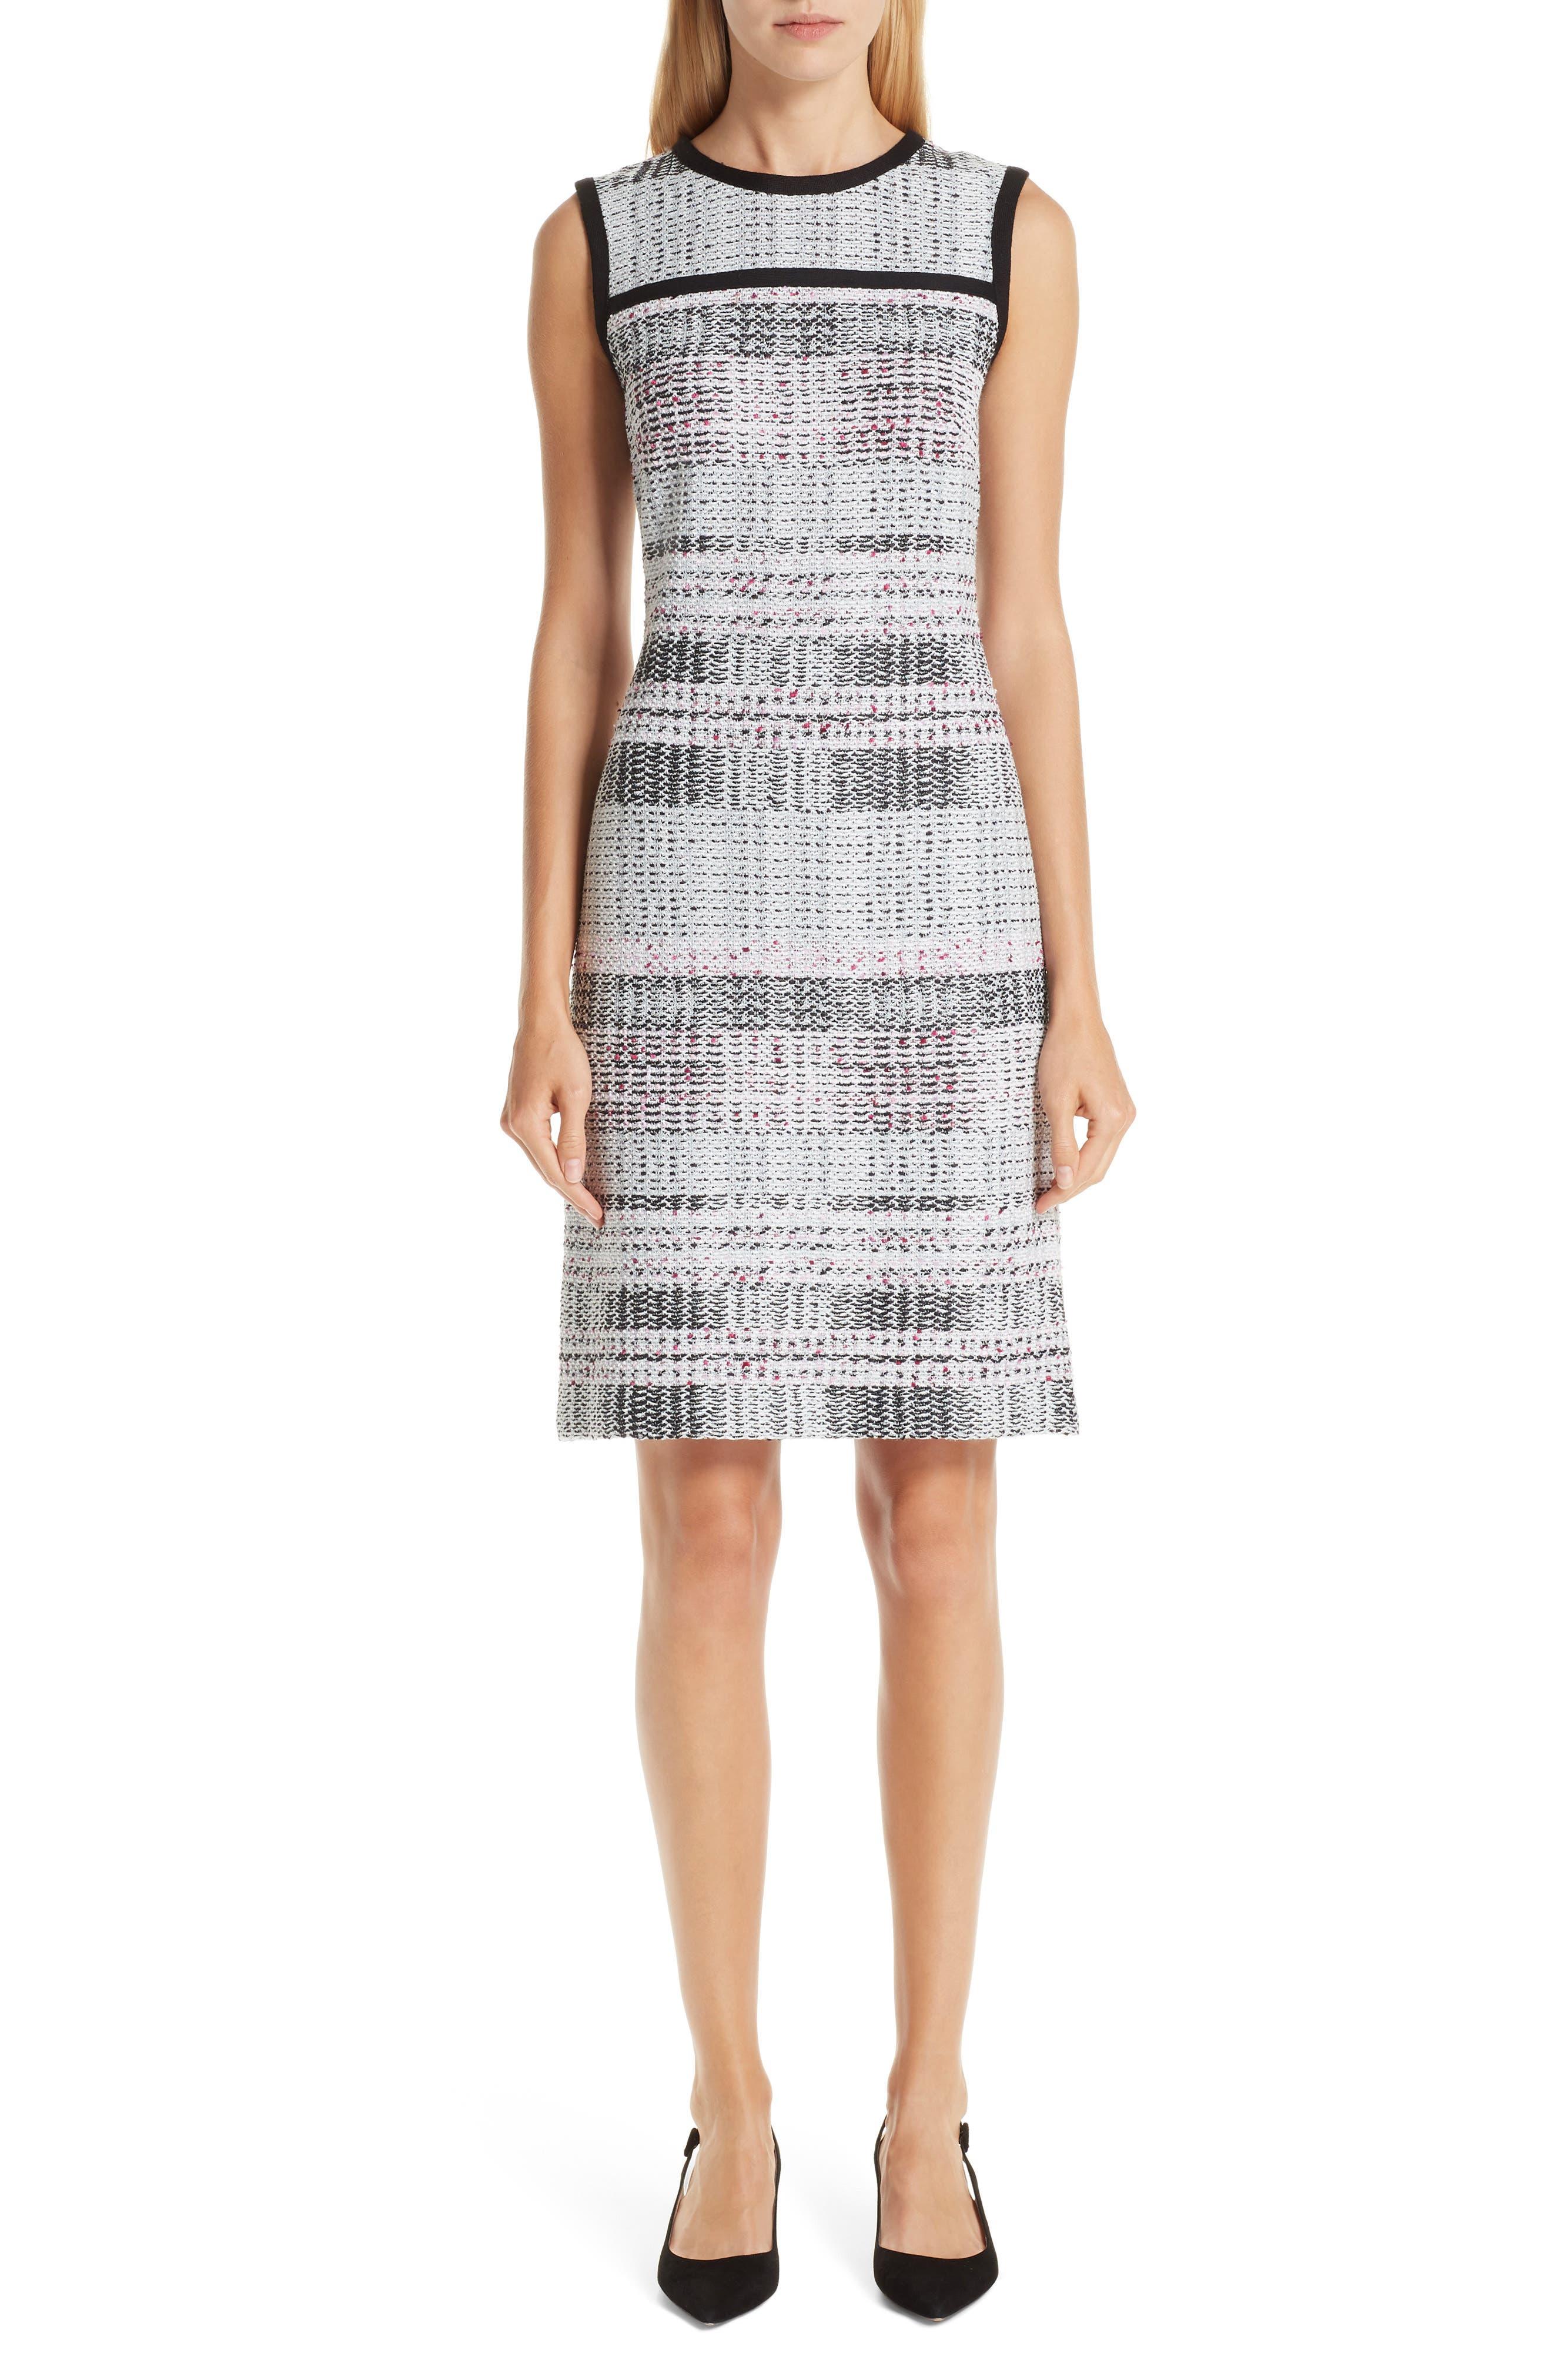 ST. JOHN COLLECTION, Bianca Plaid Knit Sheath Dress, Main thumbnail 1, color, GREY MULTI